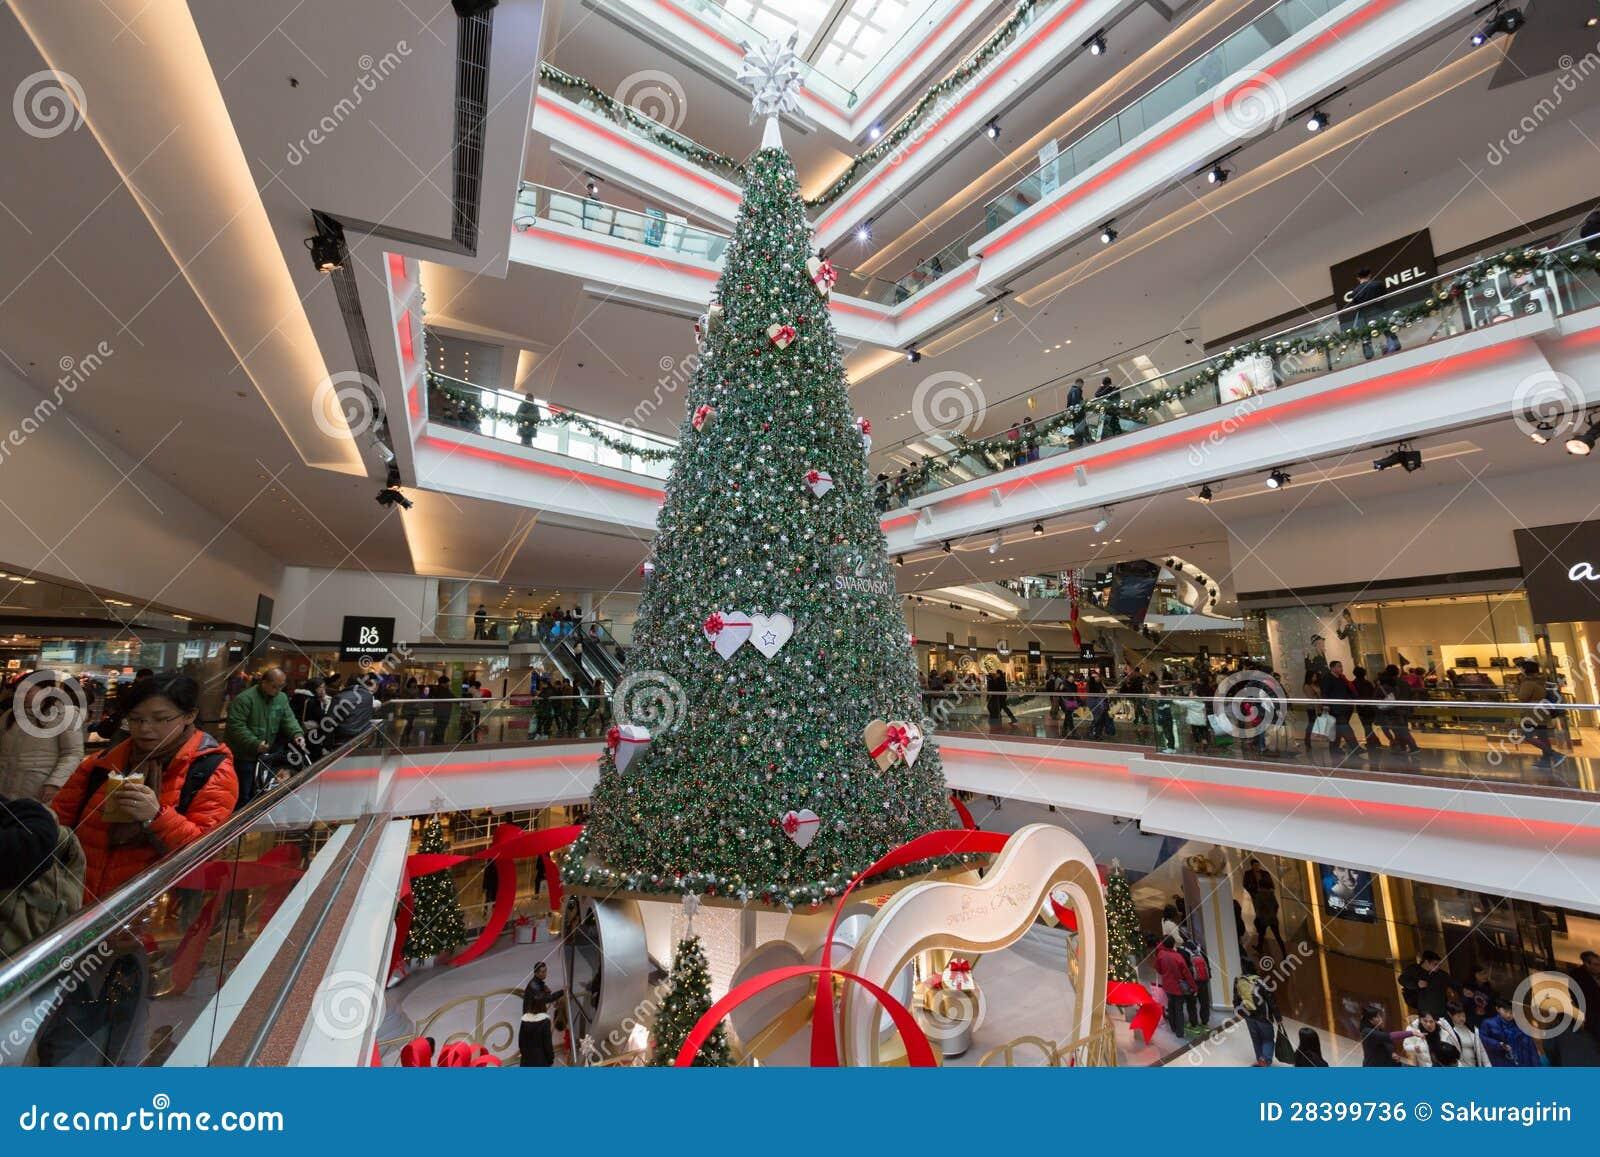 China Christmas Tree Decorations